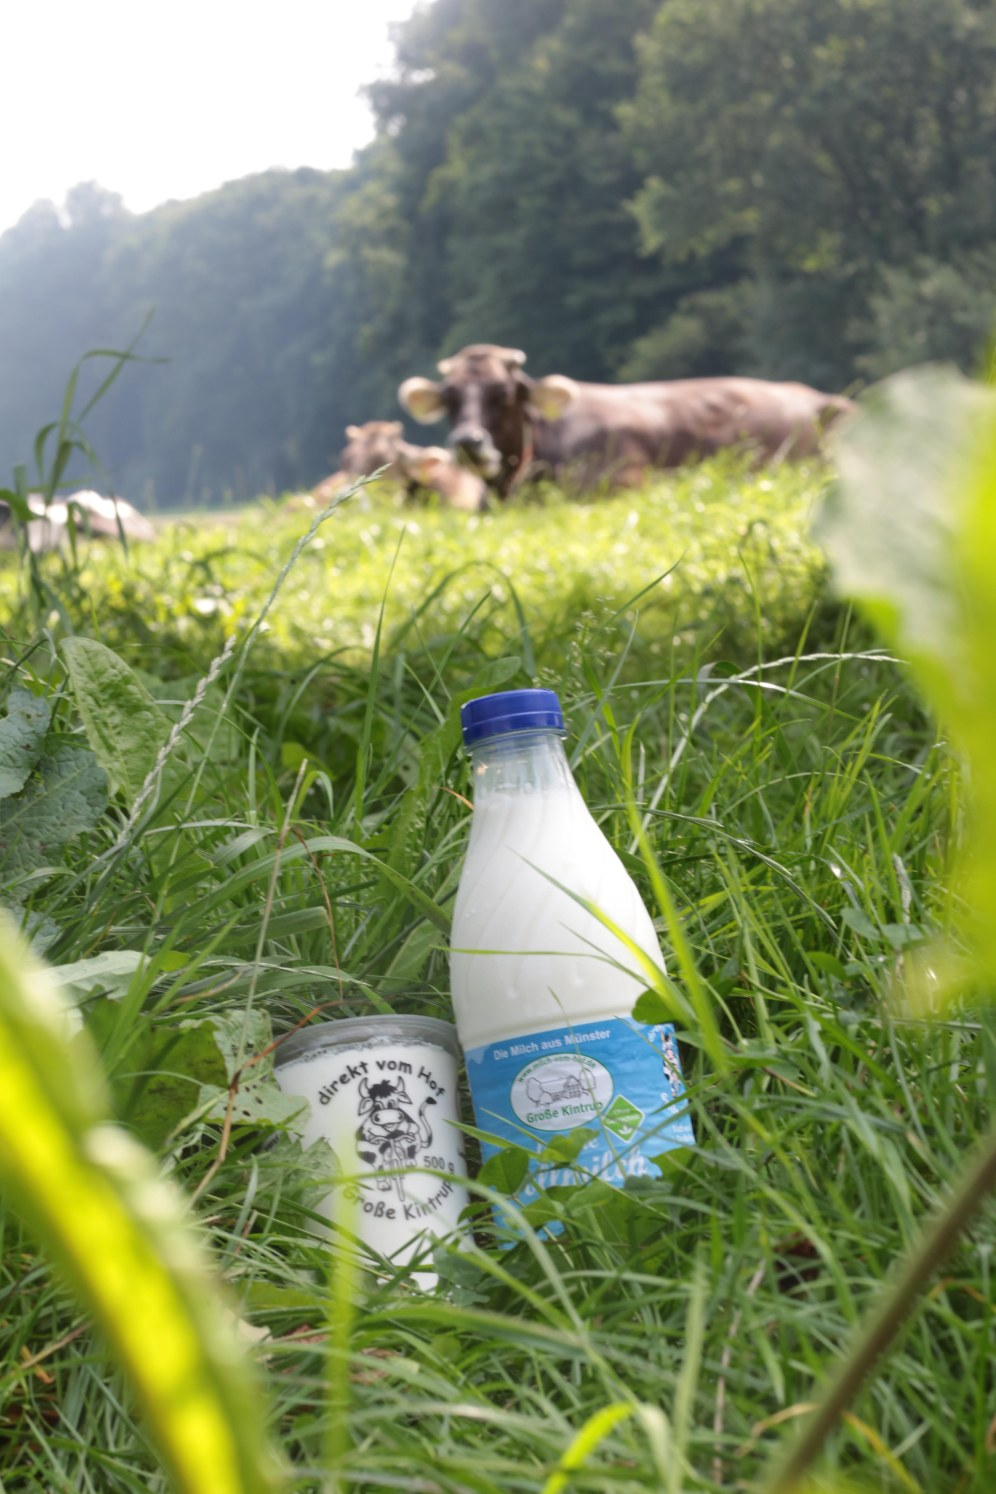 Milch und Joghurt Hof Große Kintrup © Maren Kuiter